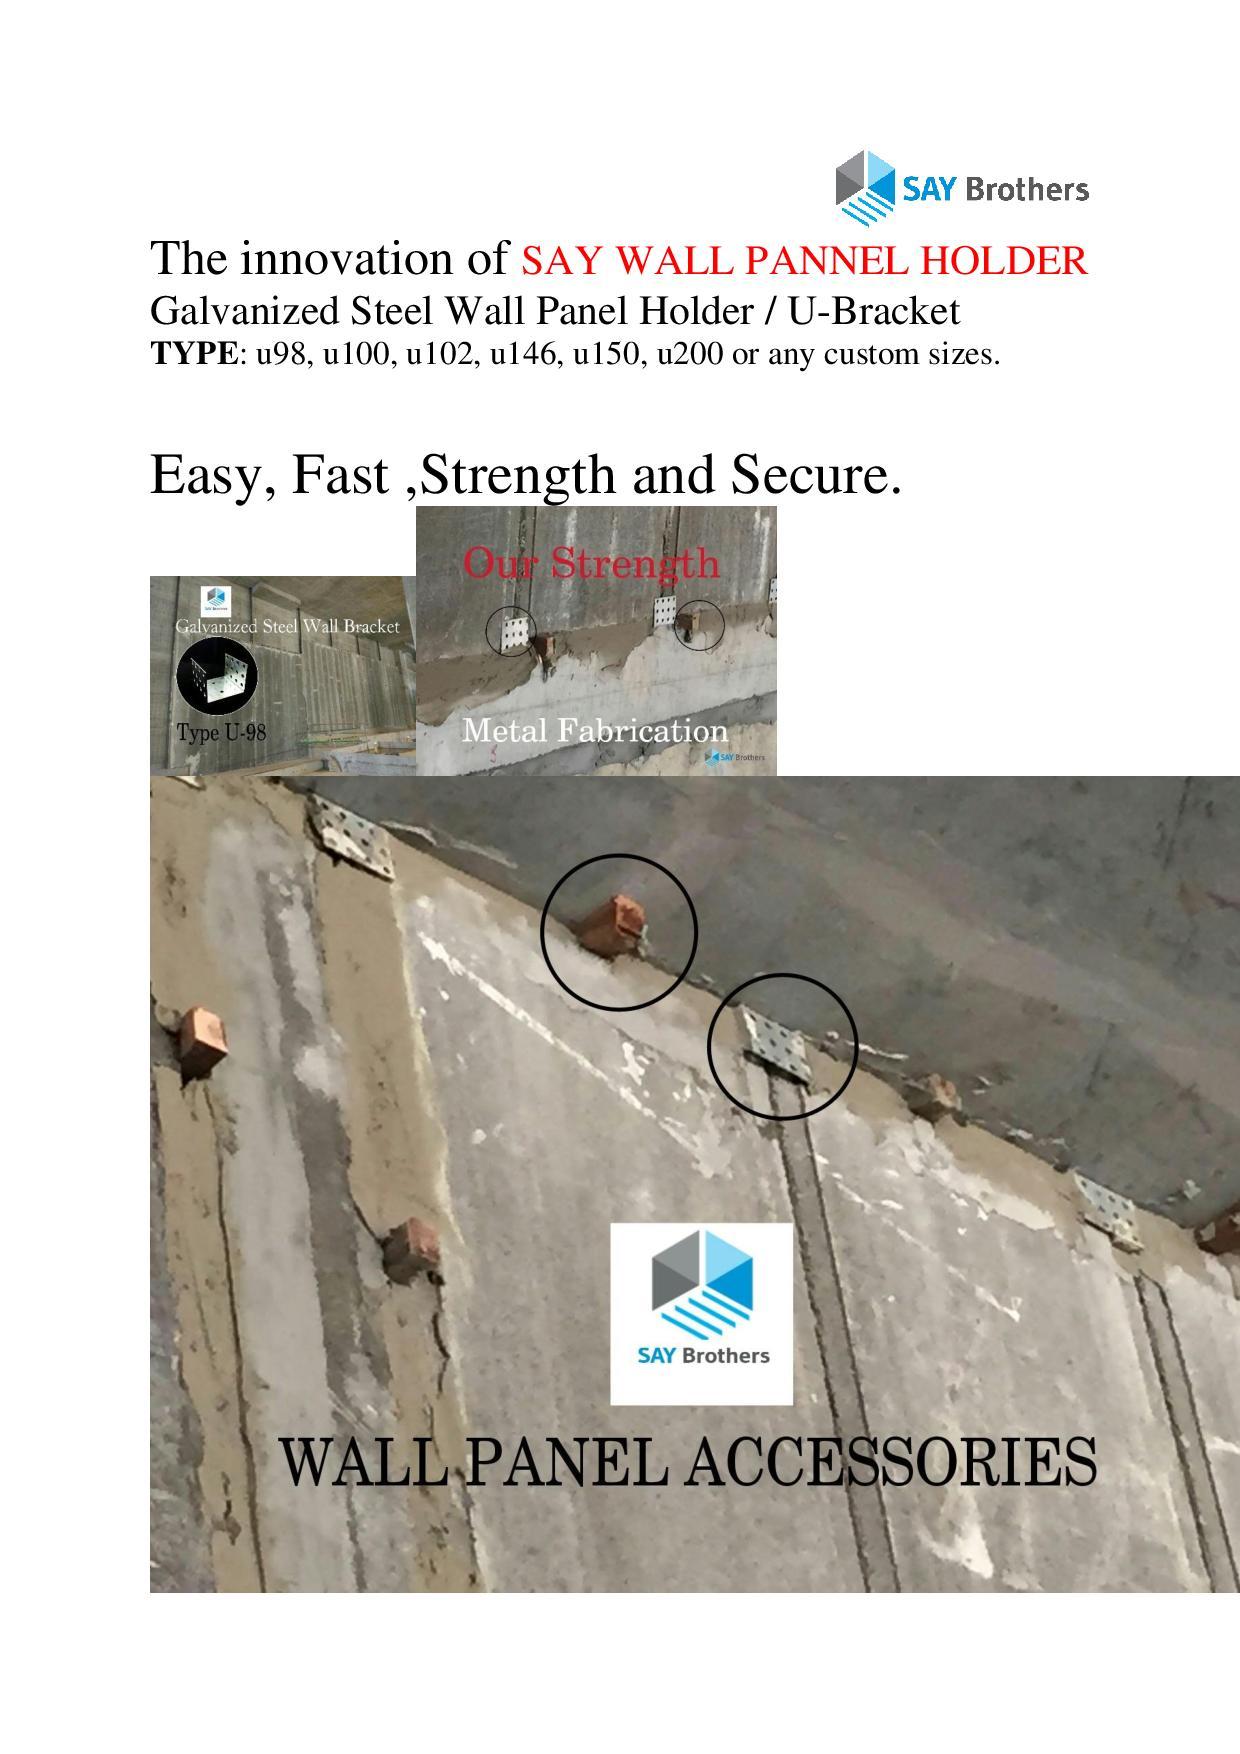 Wall Panel Holder